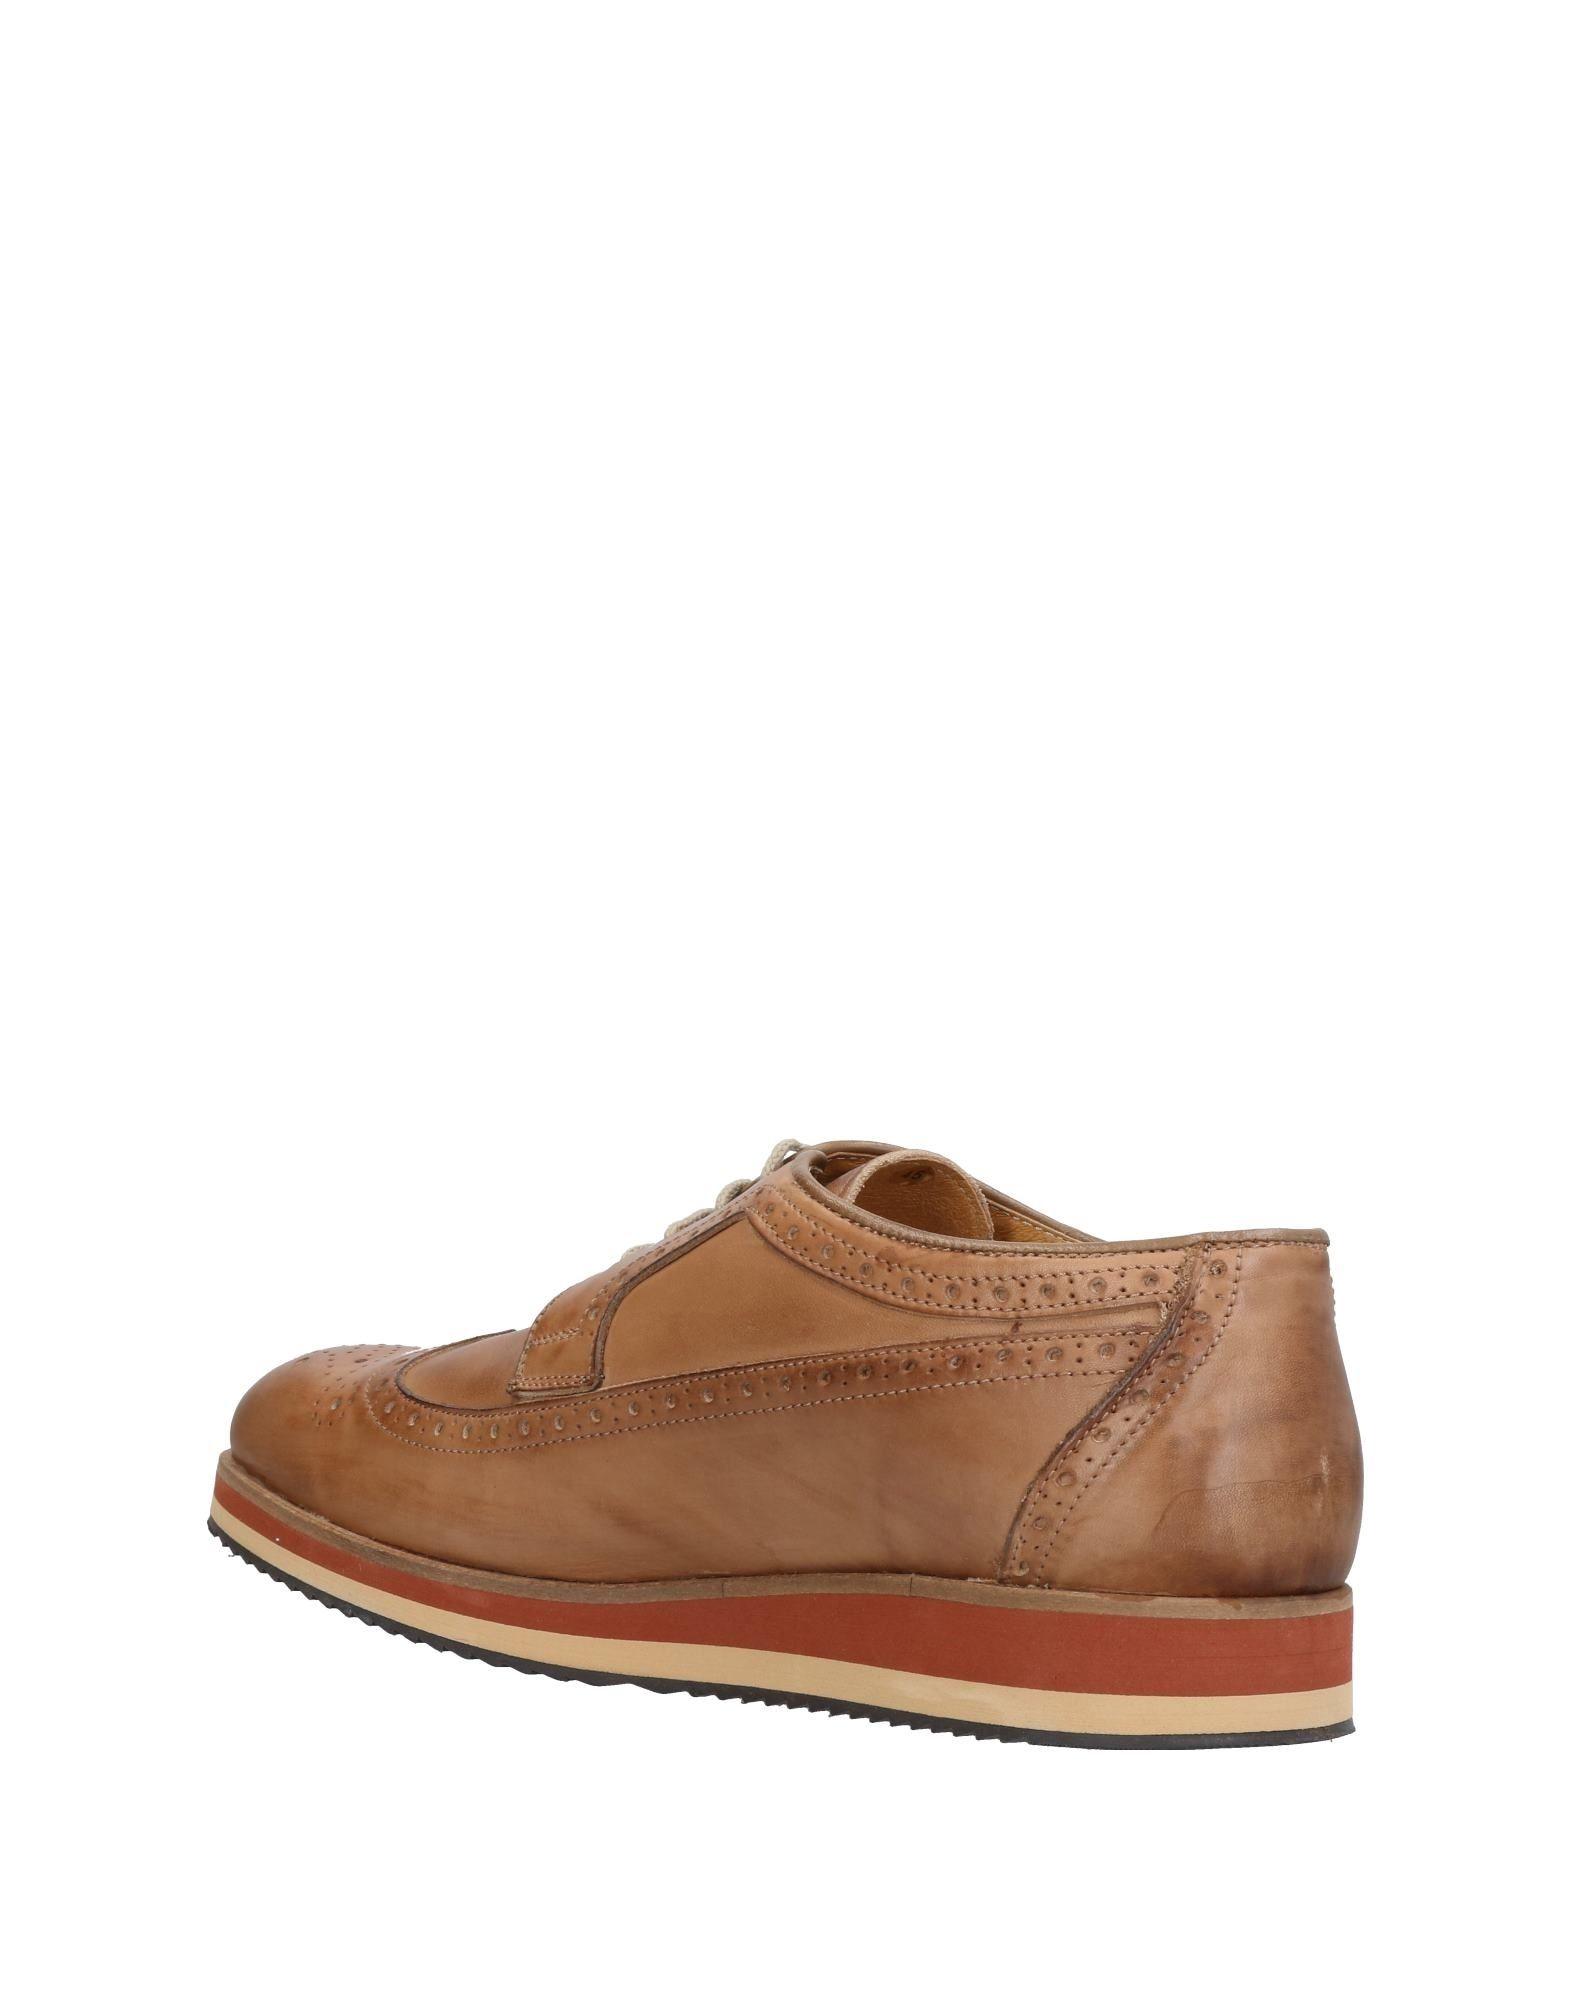 CHAUSSURES - Chaussures à lacetsBruno Verri PnUumeVL